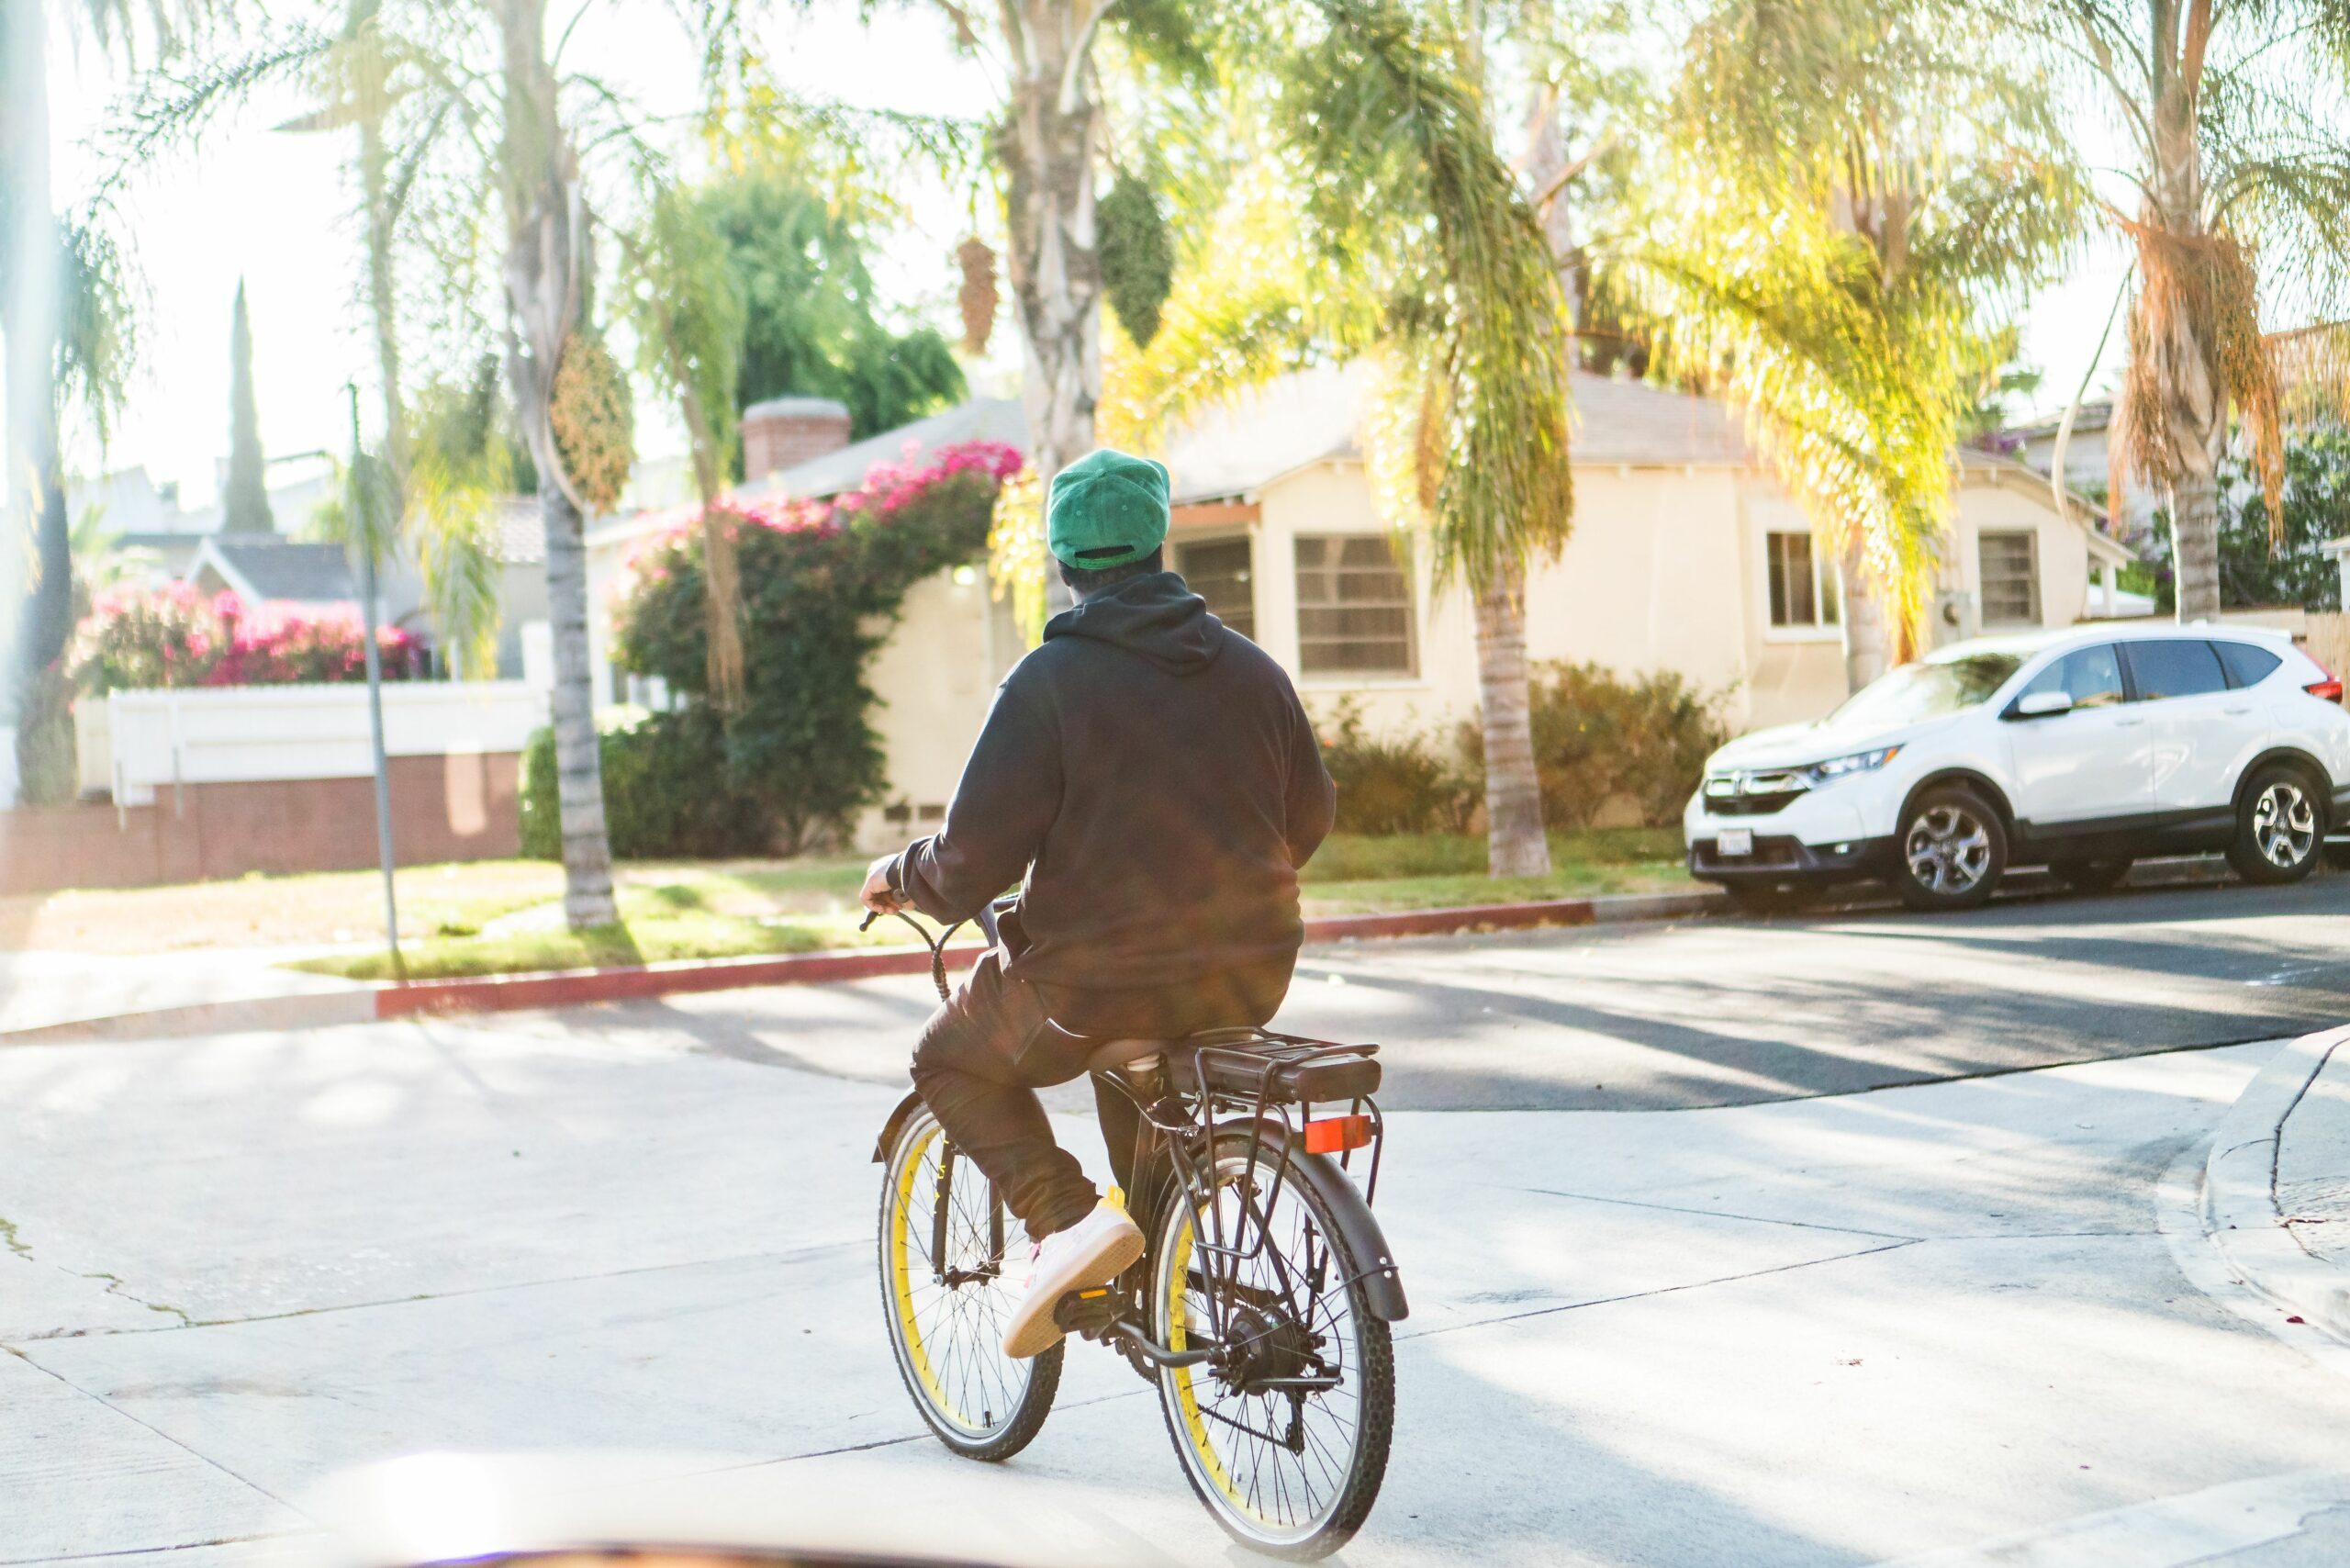 Rakeem Miles riding off on his EB11 eBike